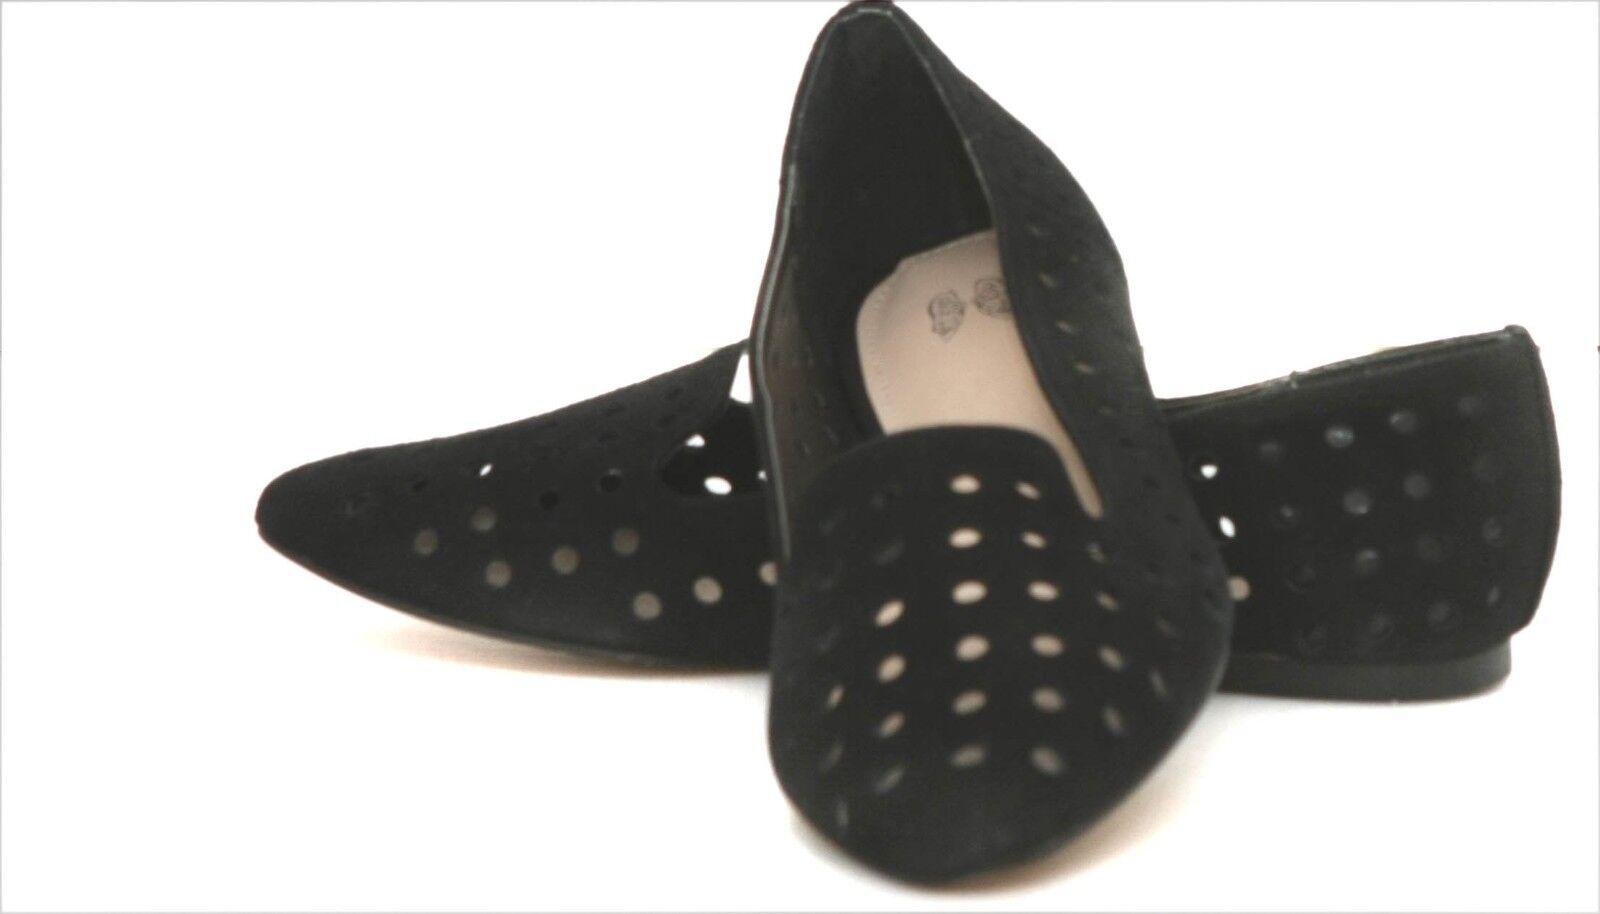 New Victoria's Secret  Pointed-toe Flat suede women's shoes sz  7